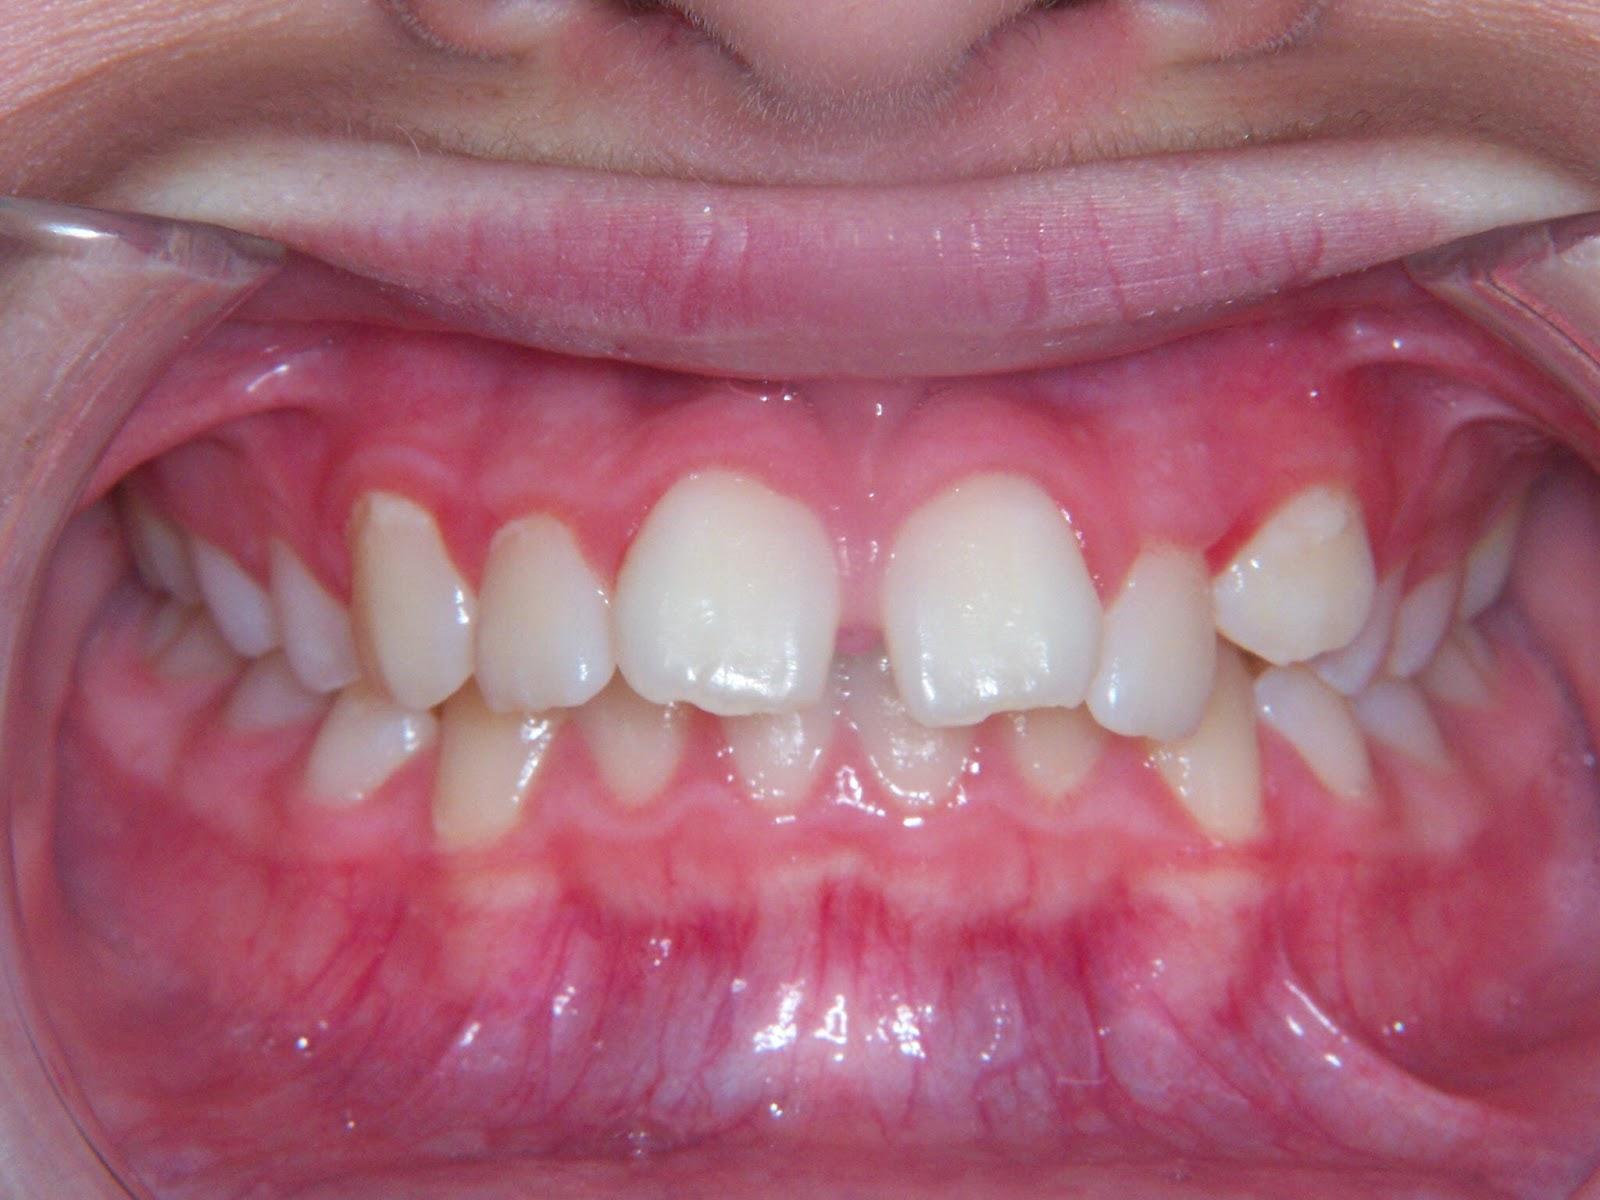 Truman Orthodontics: Overbite Correction Using a ...